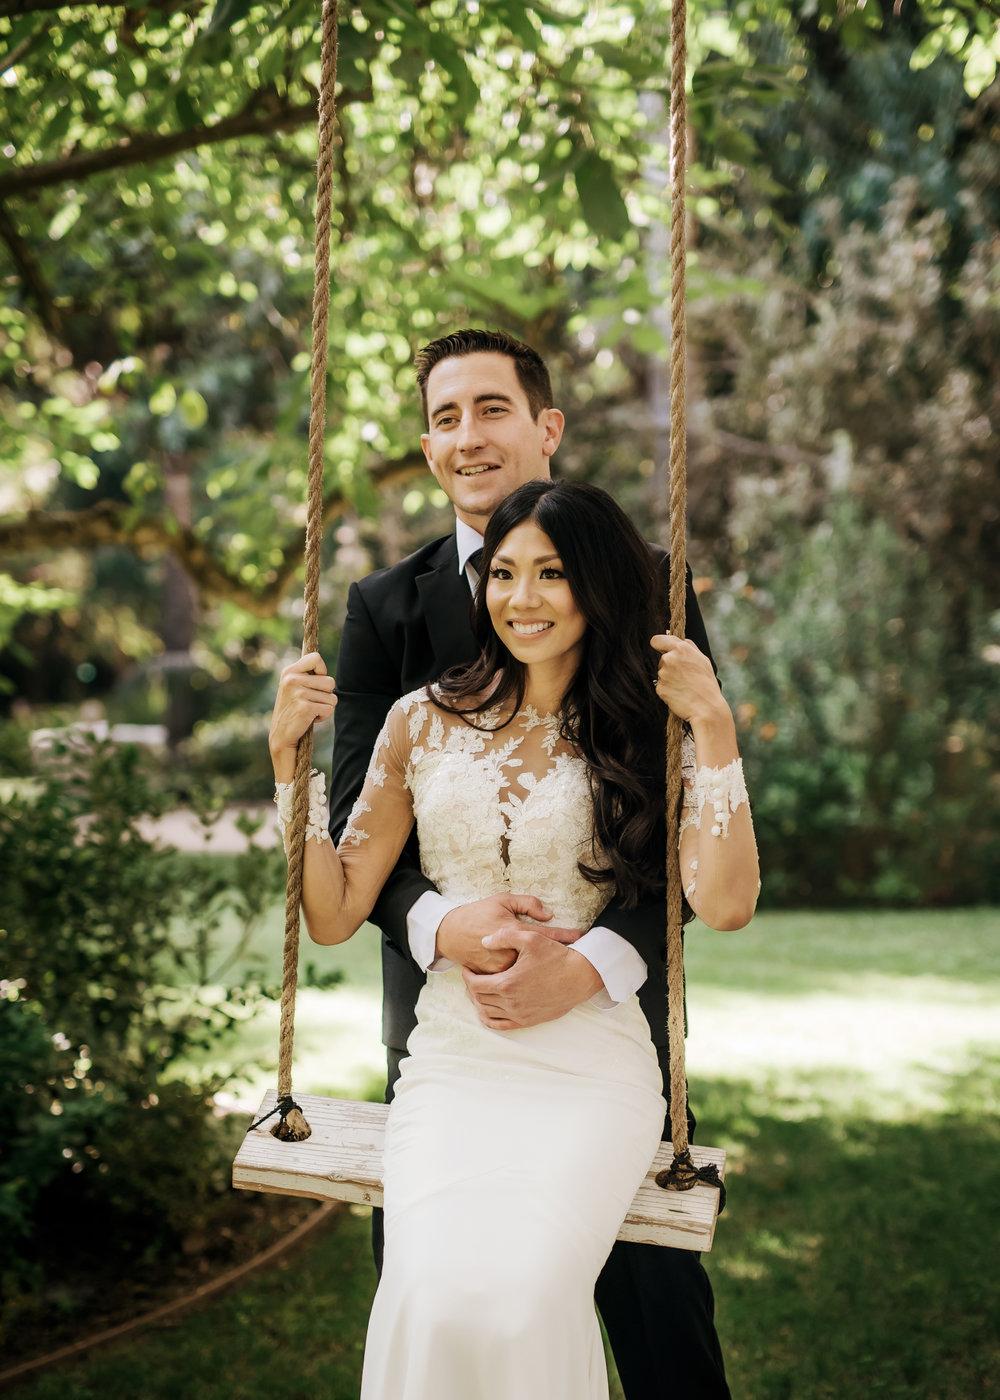 Turchin_20180825_Austinae-Brent-Wedding_133.jpg